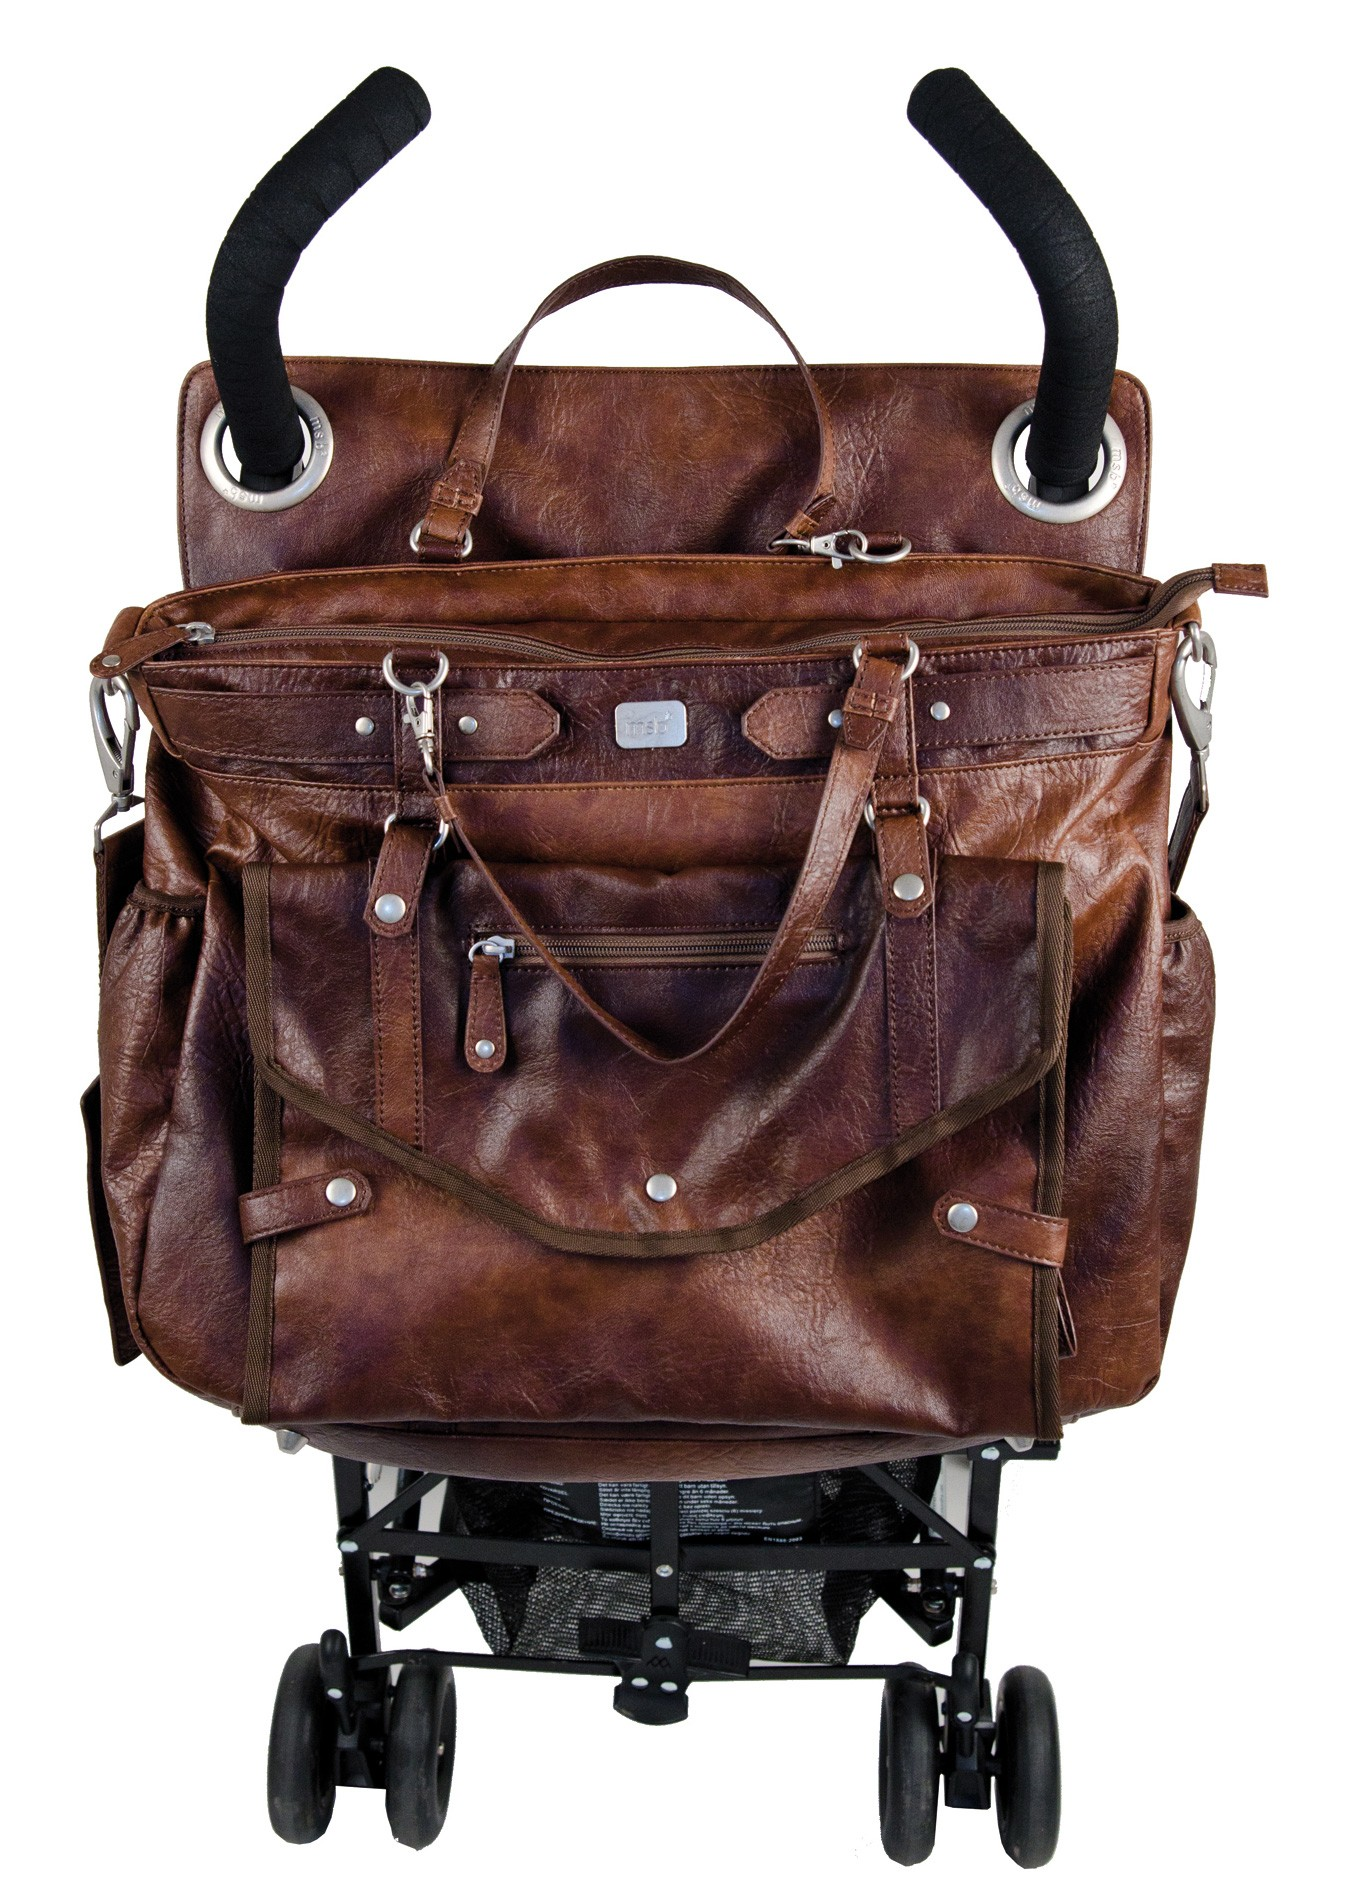 Lady Little Magic à Sac Stroller Bag langer Brown HB7O6H